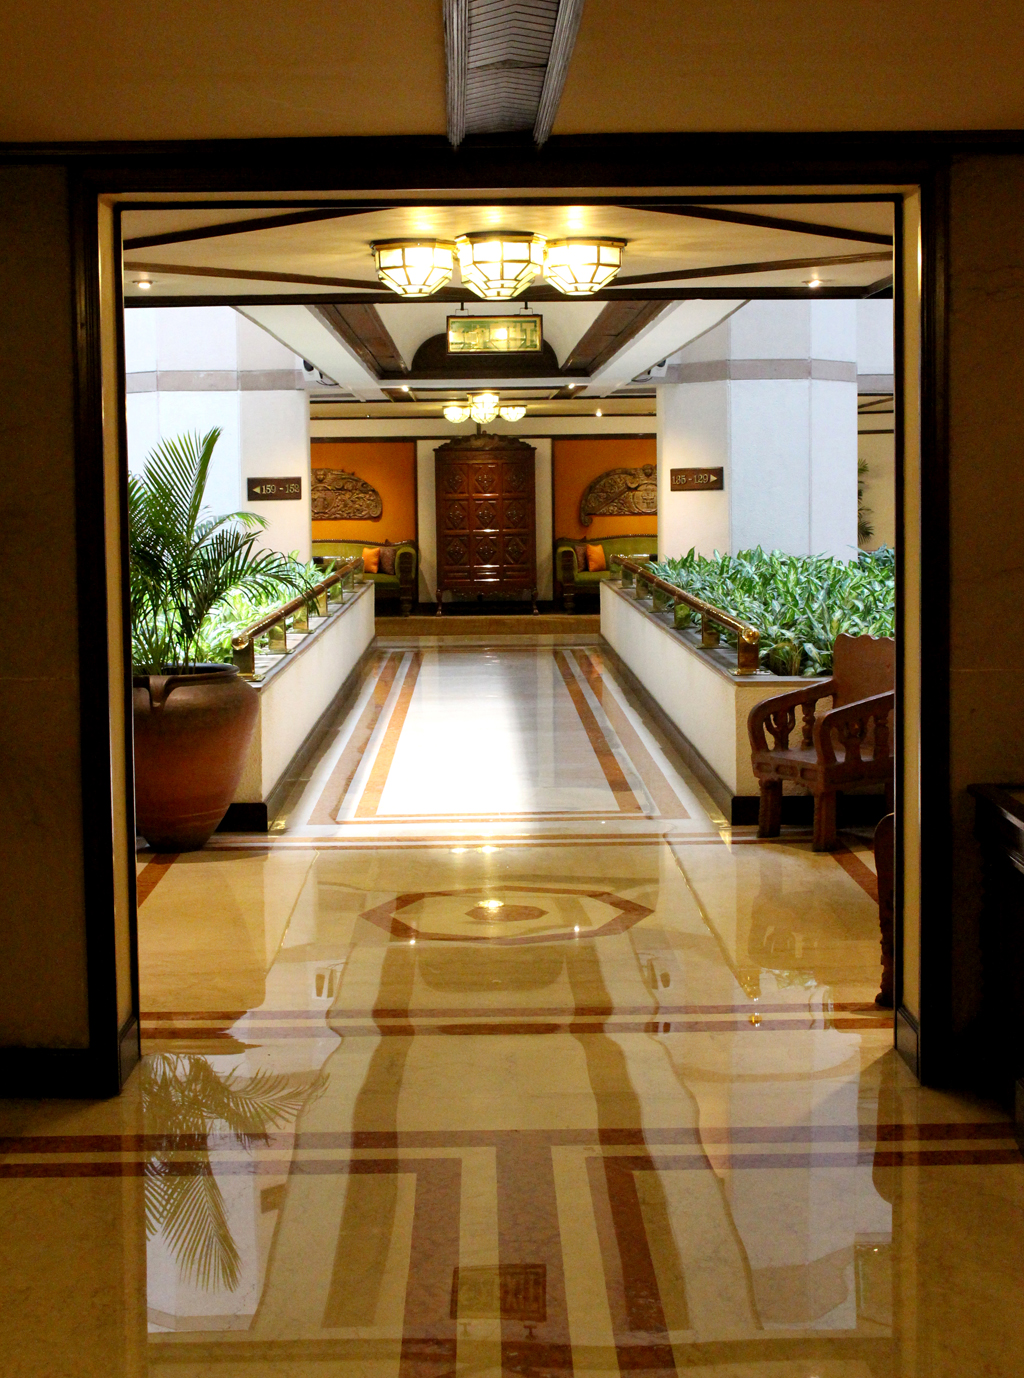 Tag Bengal Detalle de los pasillos del Tag Bengal, muebles ...